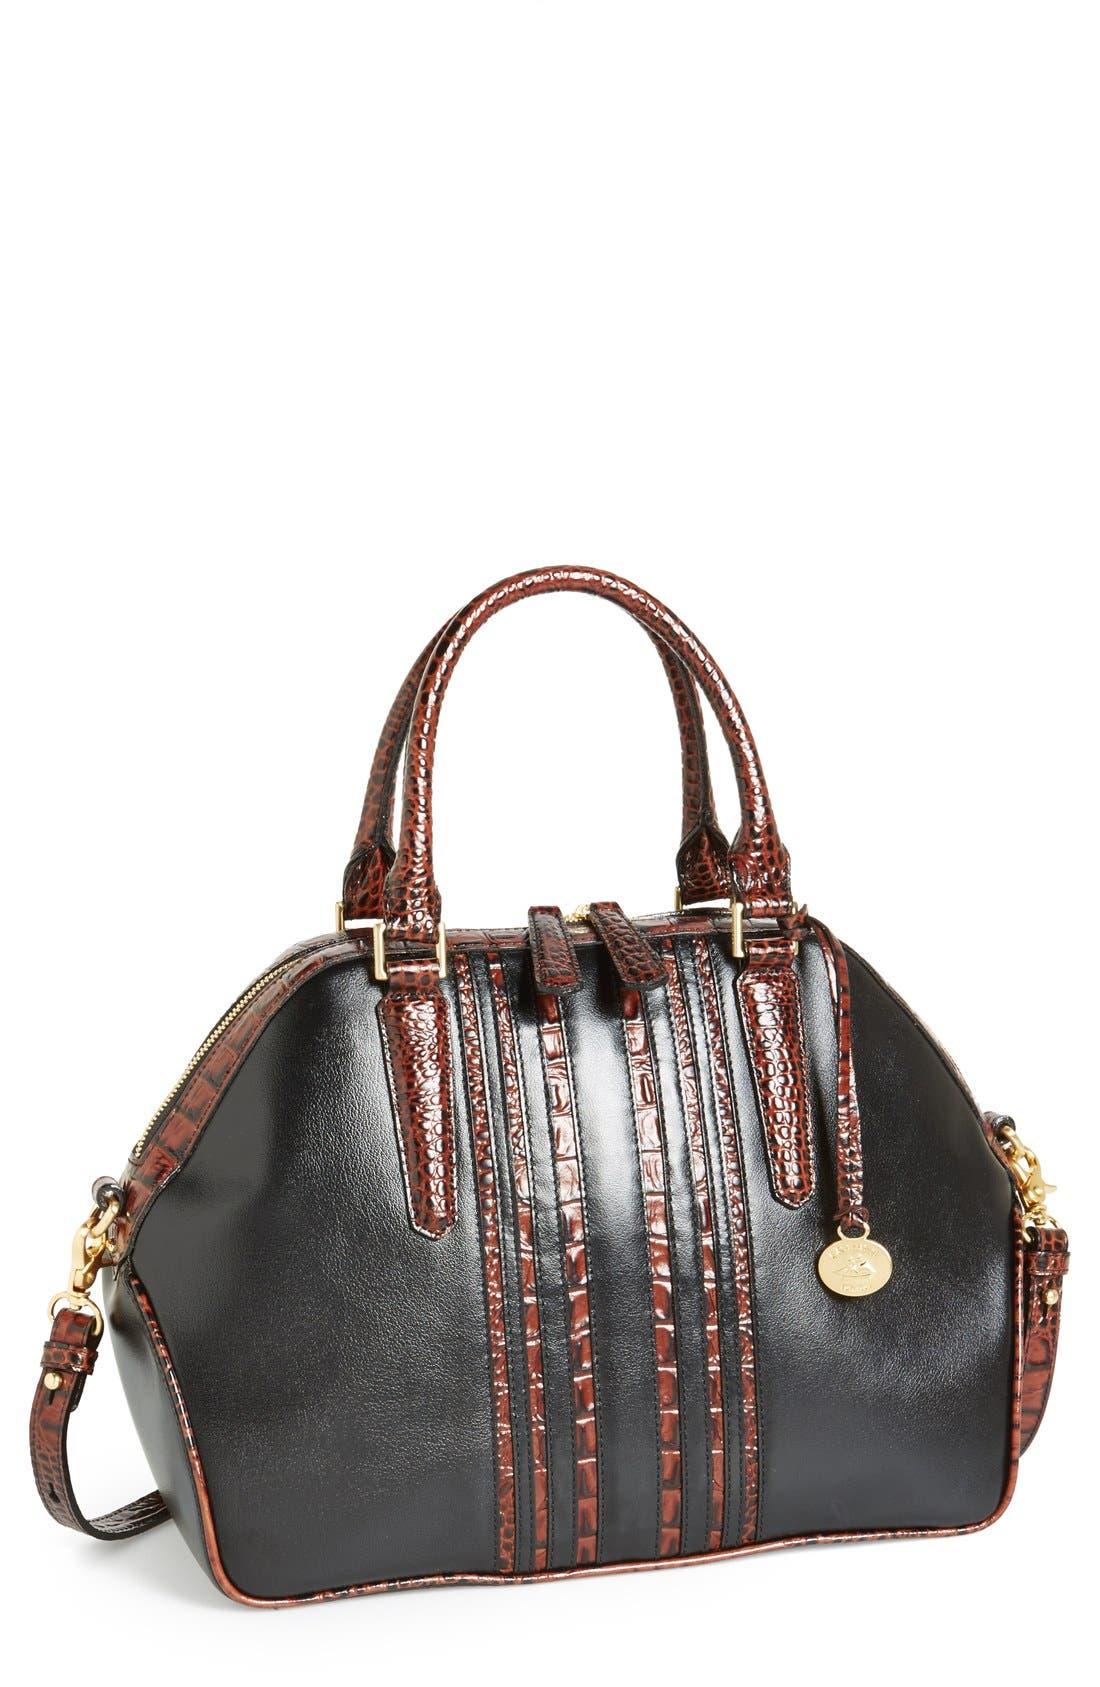 Alternate Image 1 Selected - Brahmin 'Hudson' Leather Satchel